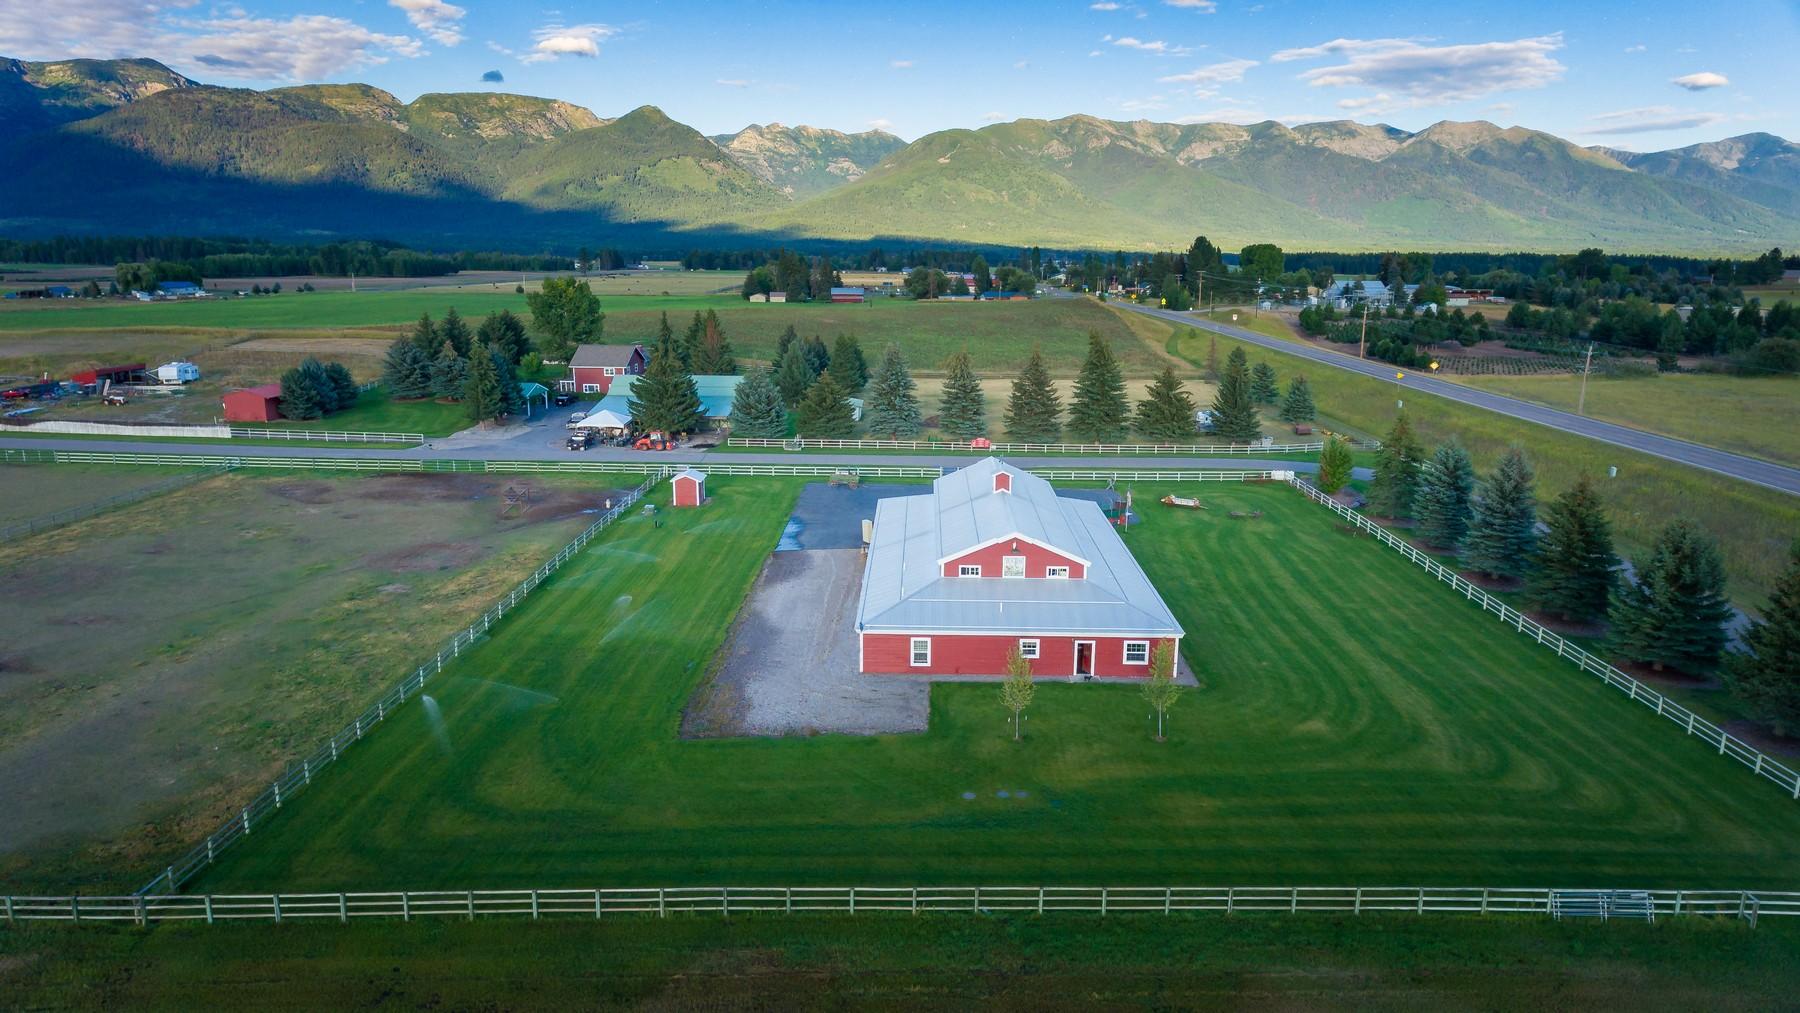 Additional photo for property listing at 179 Hill Rd , Bigfork, MT 59911 179  Hill Rd Bigfork, Montana 59911 United States